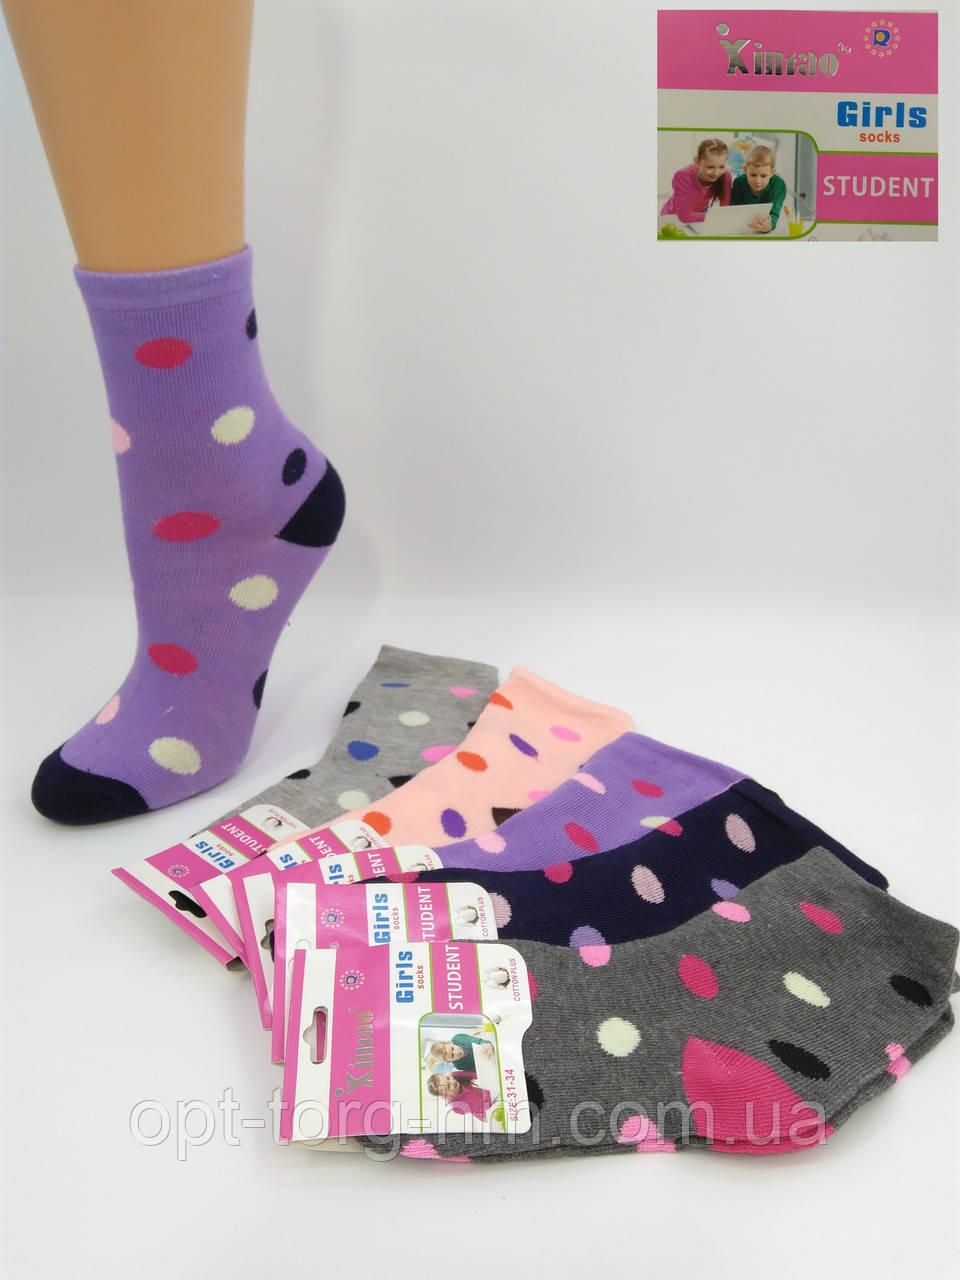 Xintao Детские носки 31-34 обувь